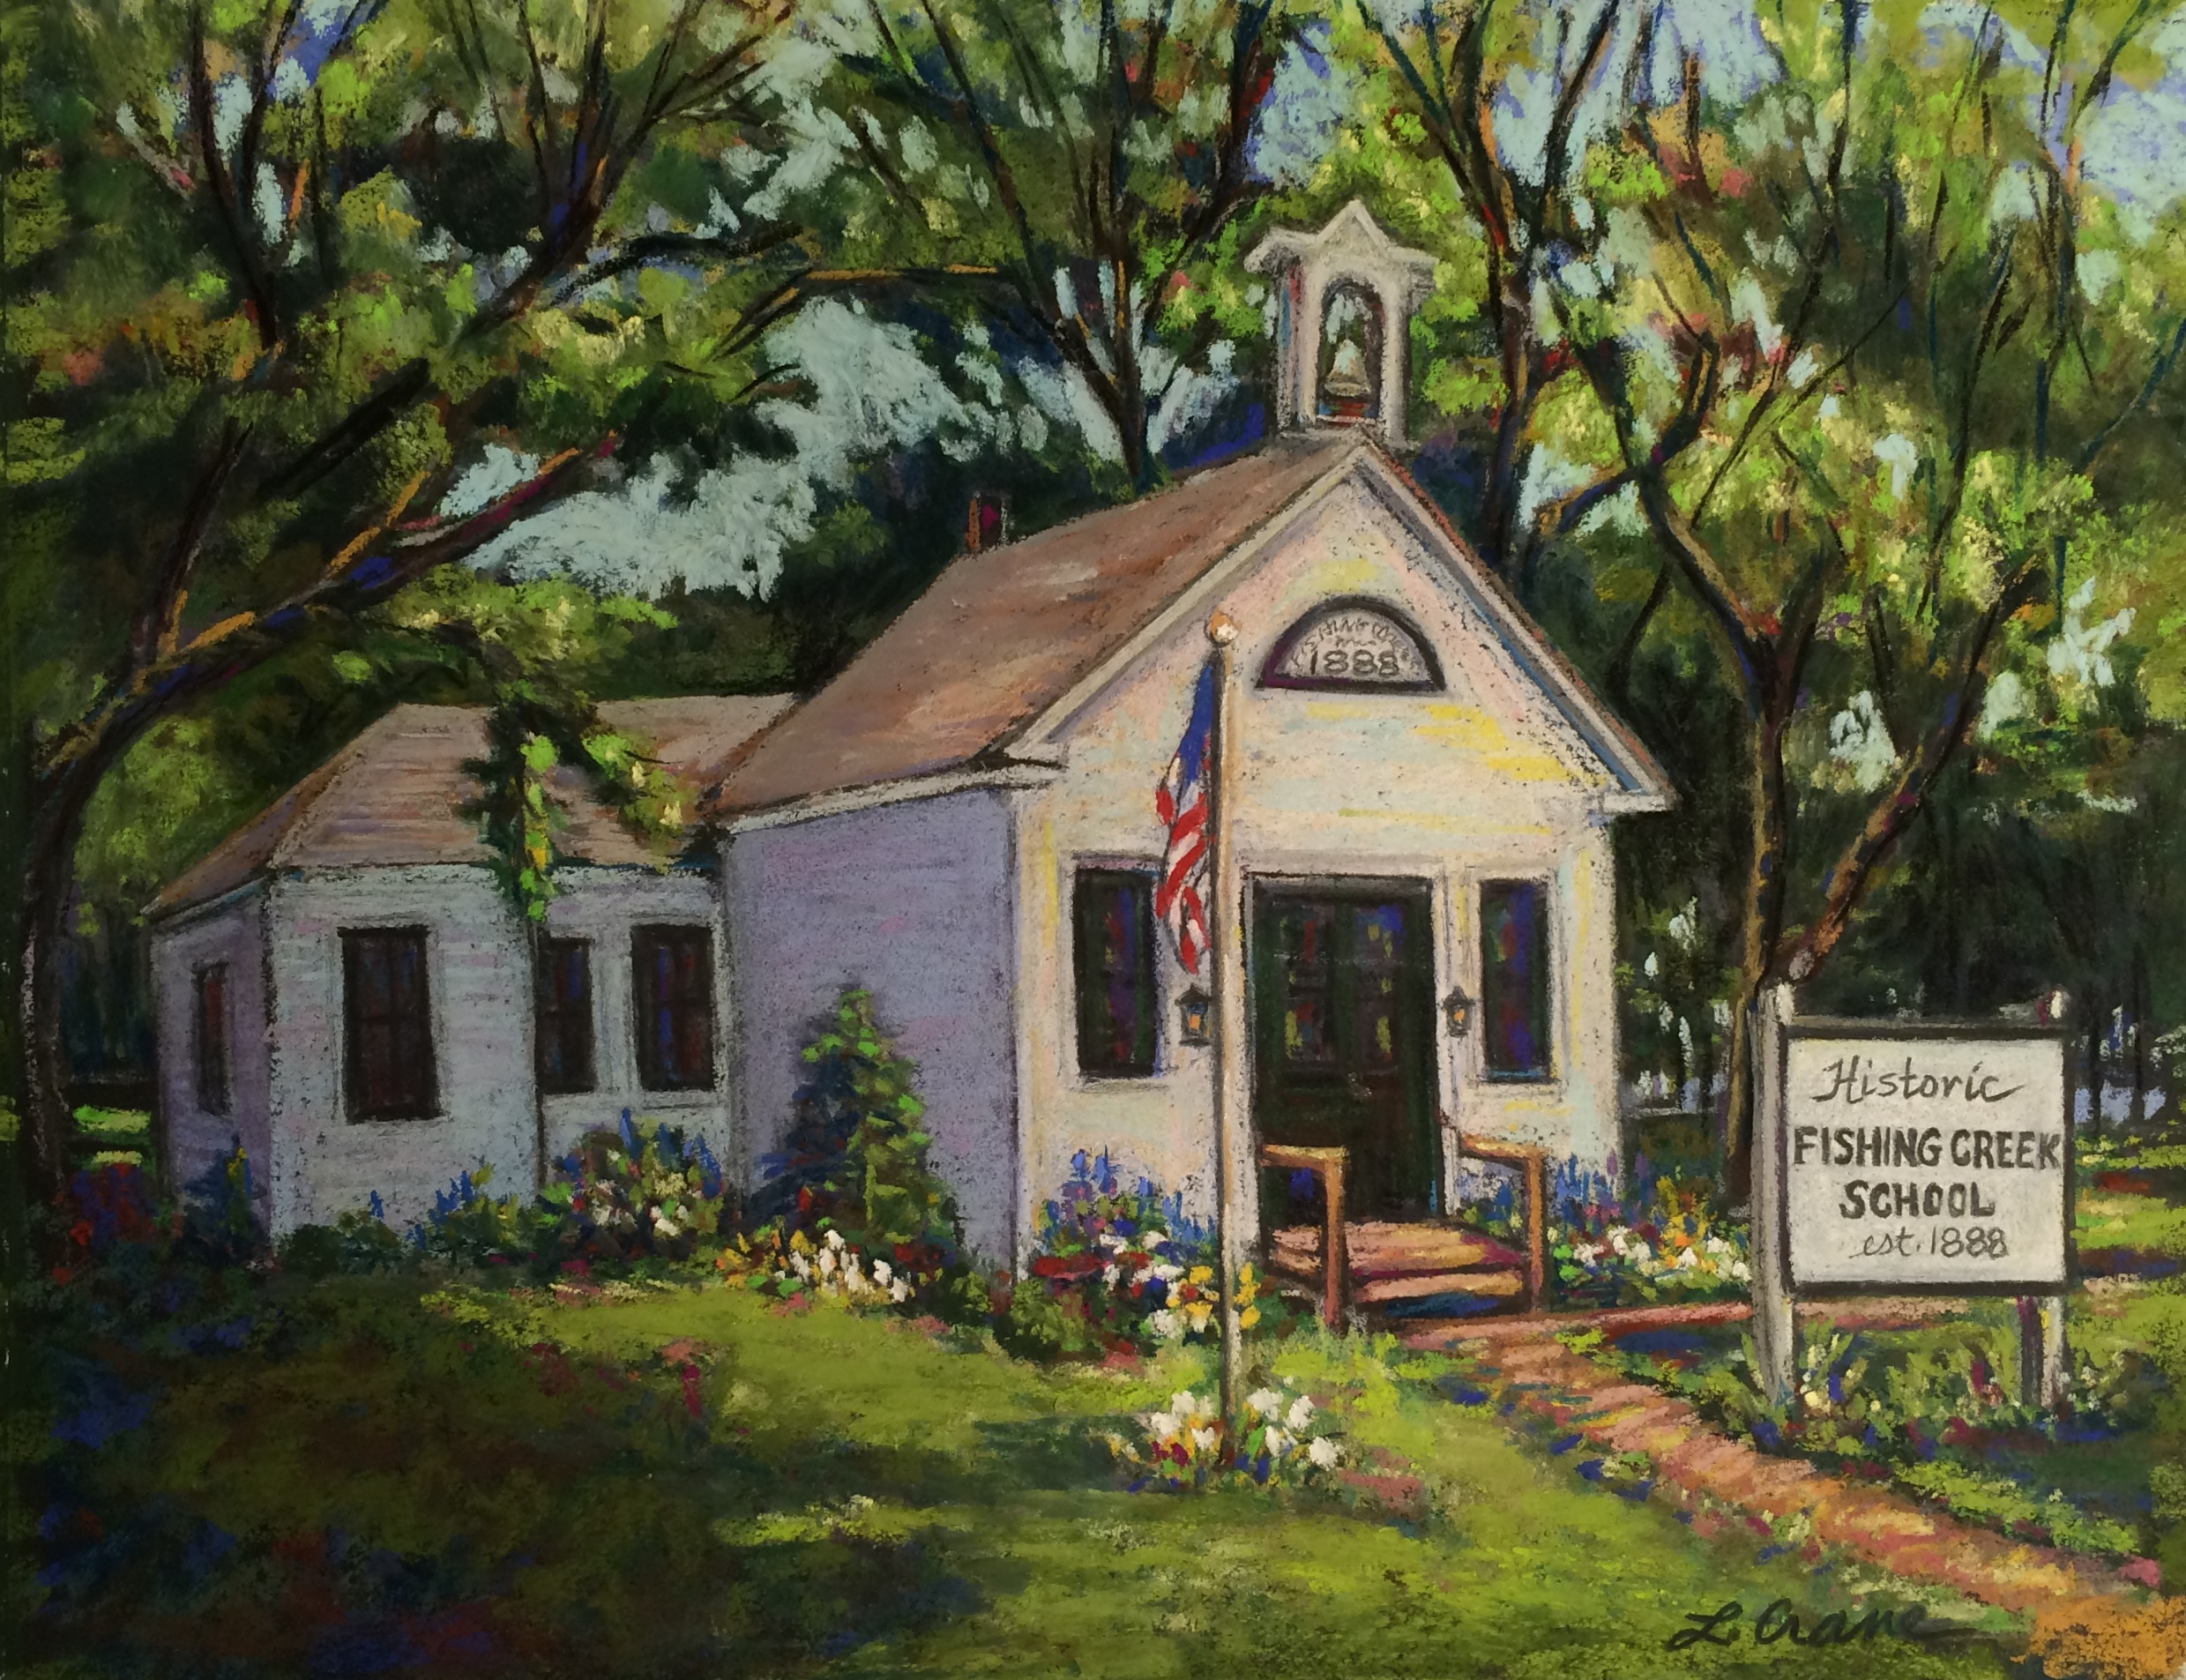 Fishing Creek Schoolhouse